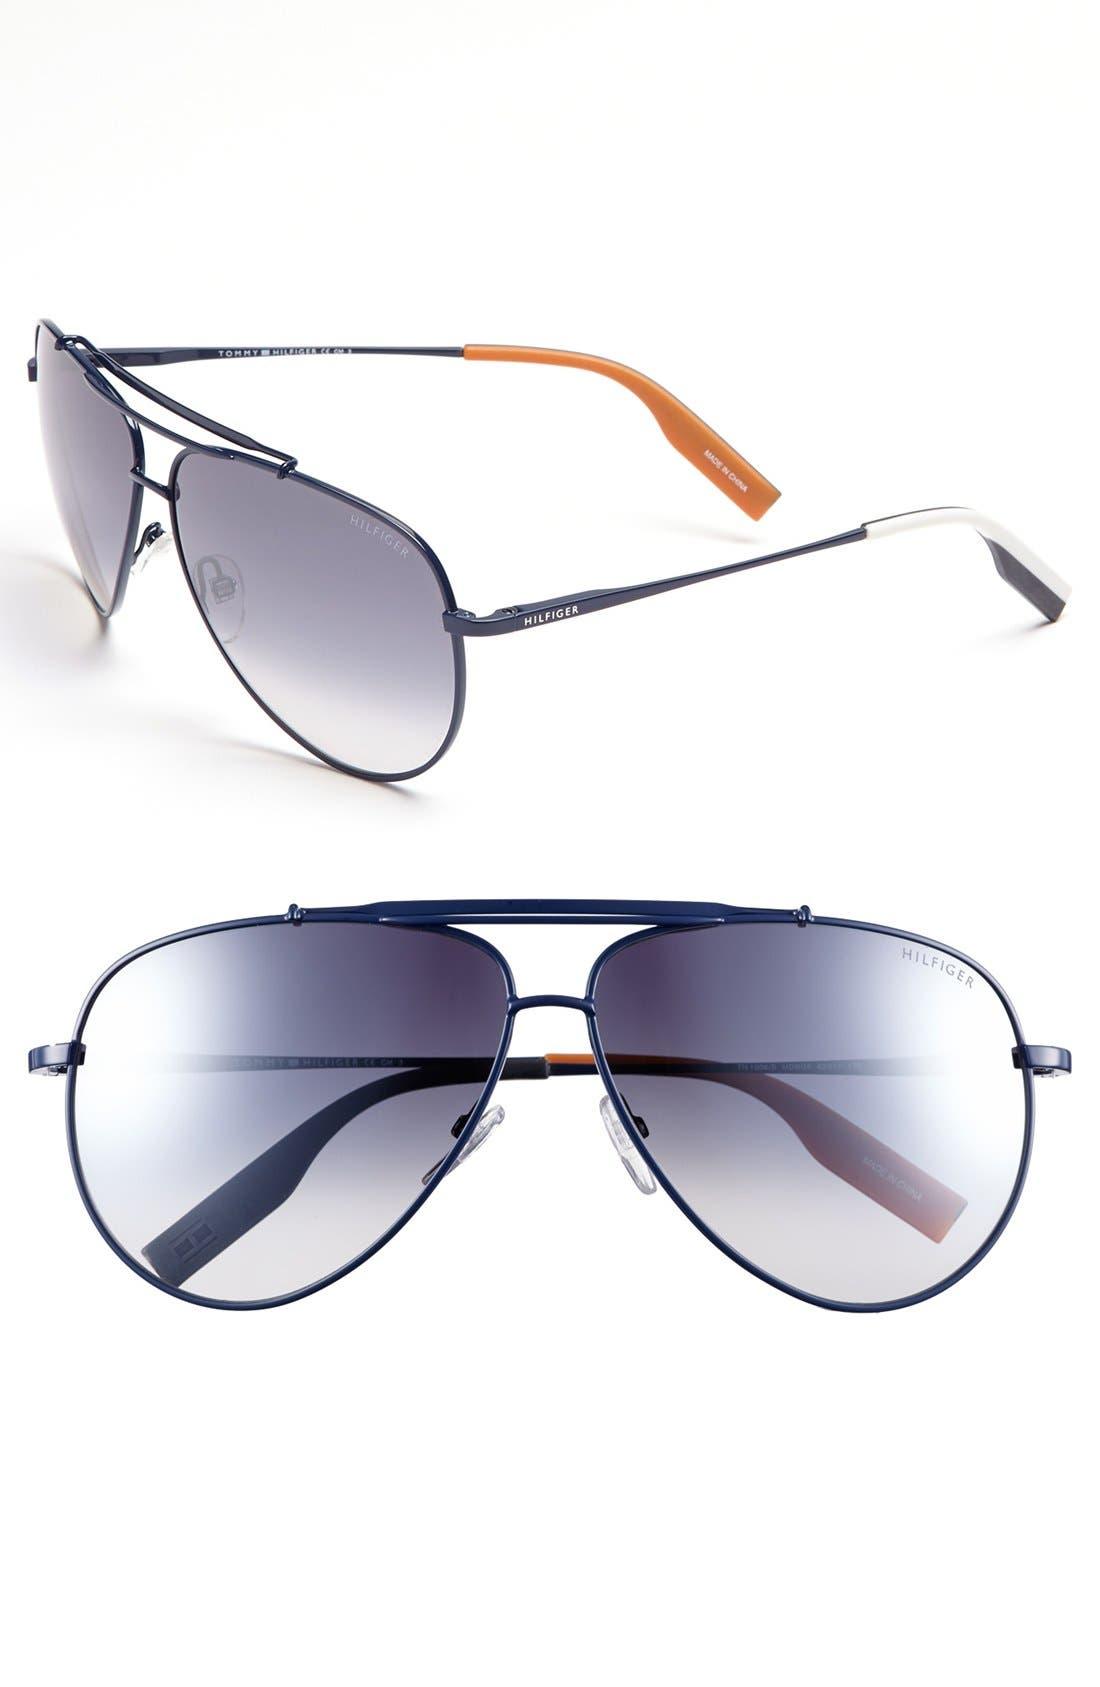 Main Image - Tommy Hilfiger 62mm Aviator Sunglasses